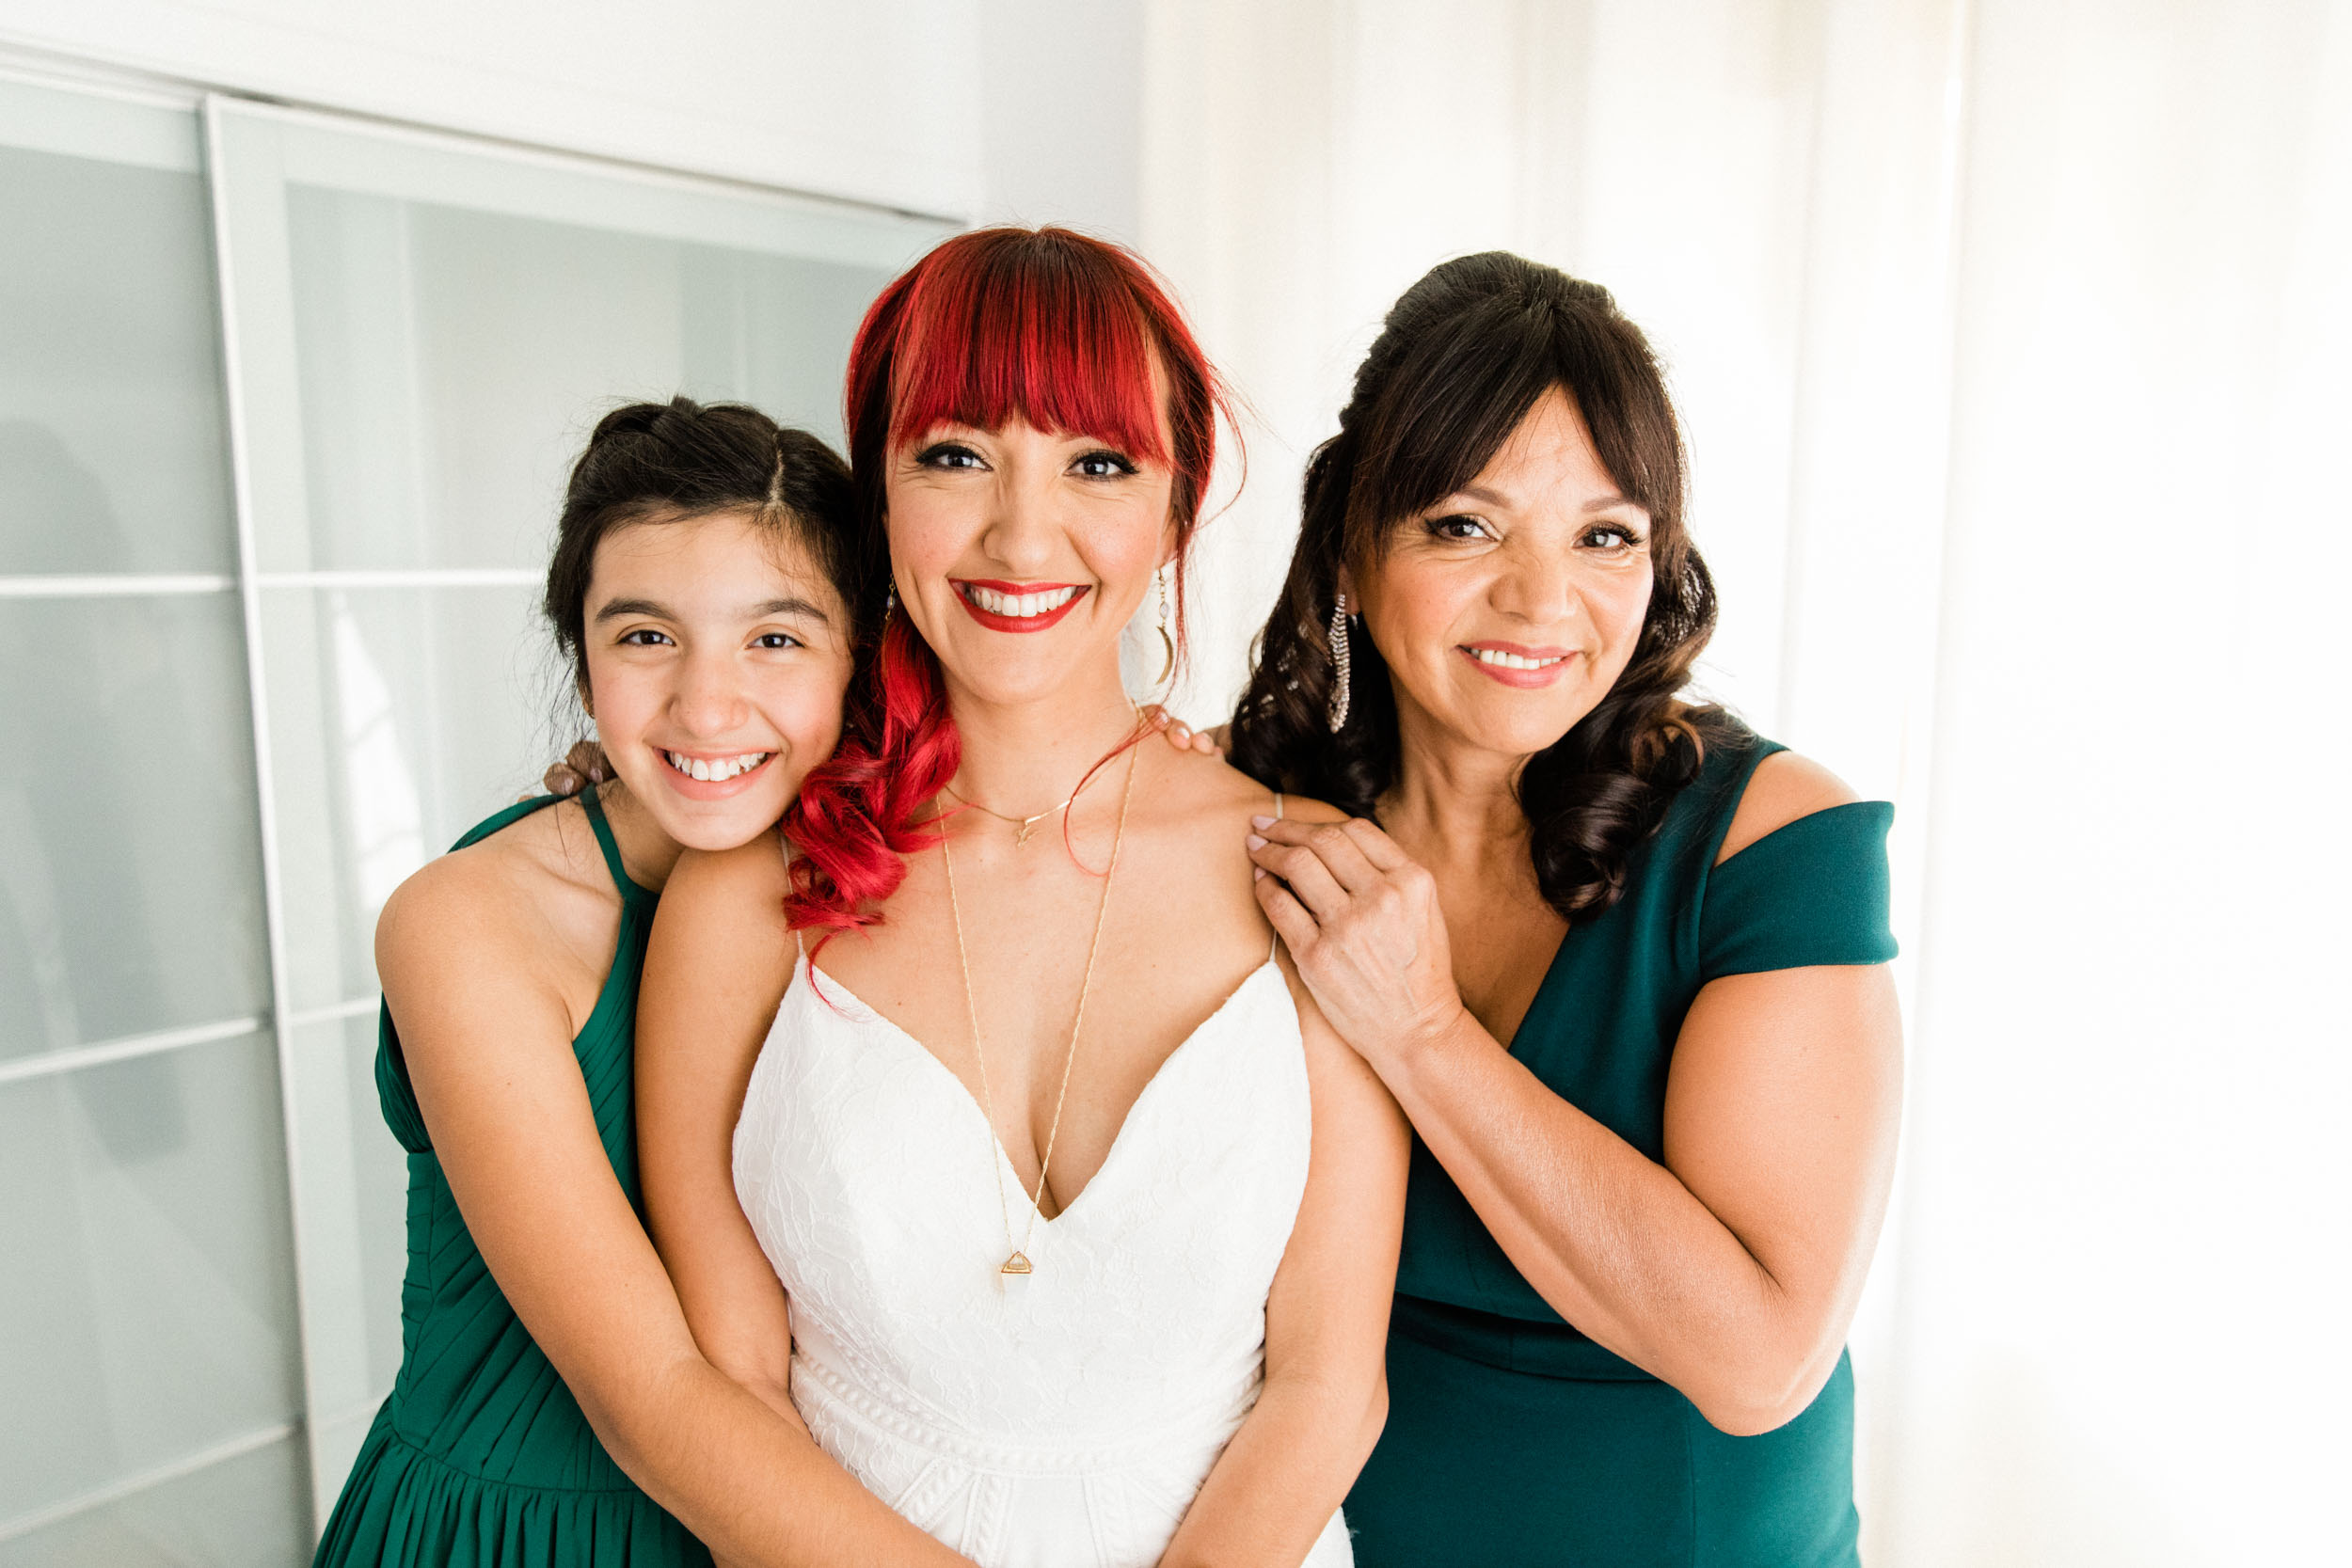 BKM-Photography-Los-Angeles-Highland-Park-York-Manor-Wedding-Photography-0110.jpg